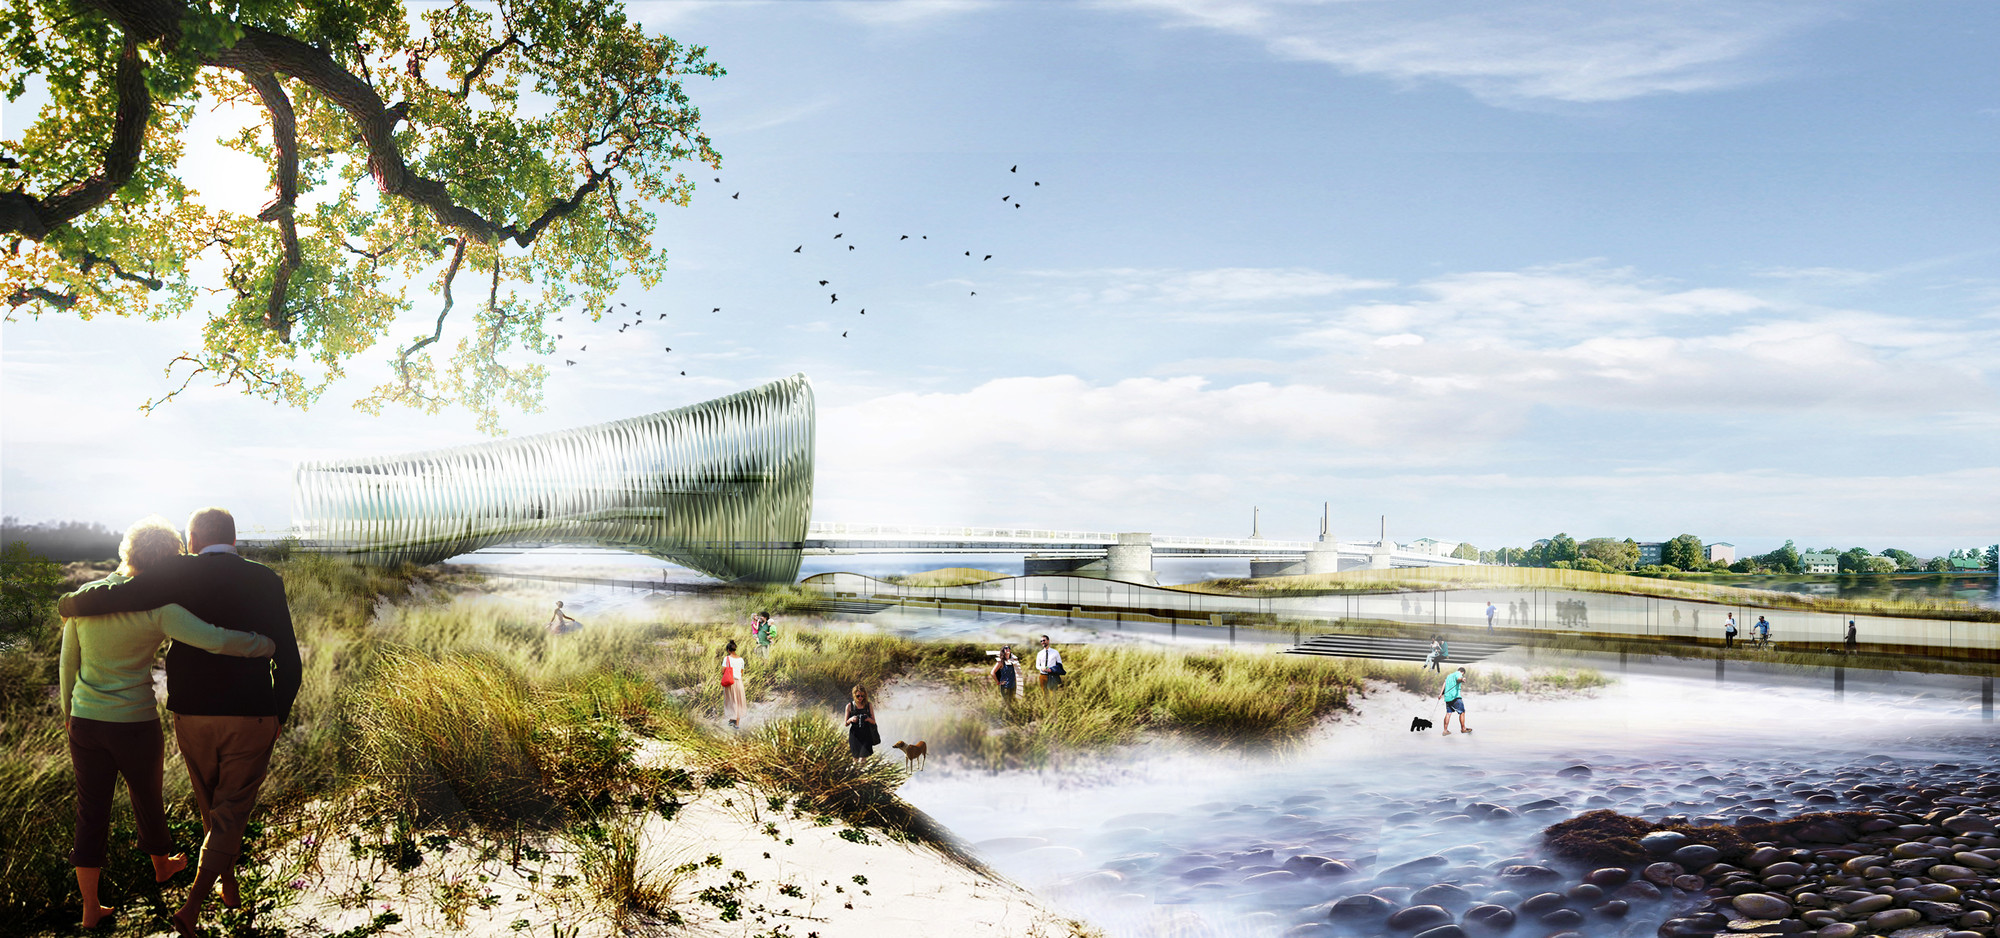 Tercer Lugar Baltic Sea Art Park / BAT + ACHA ZABALLA Arquitectos, Vista del parque . Image Courtesy of BAT + ACHA ZABALLA Arquitectos